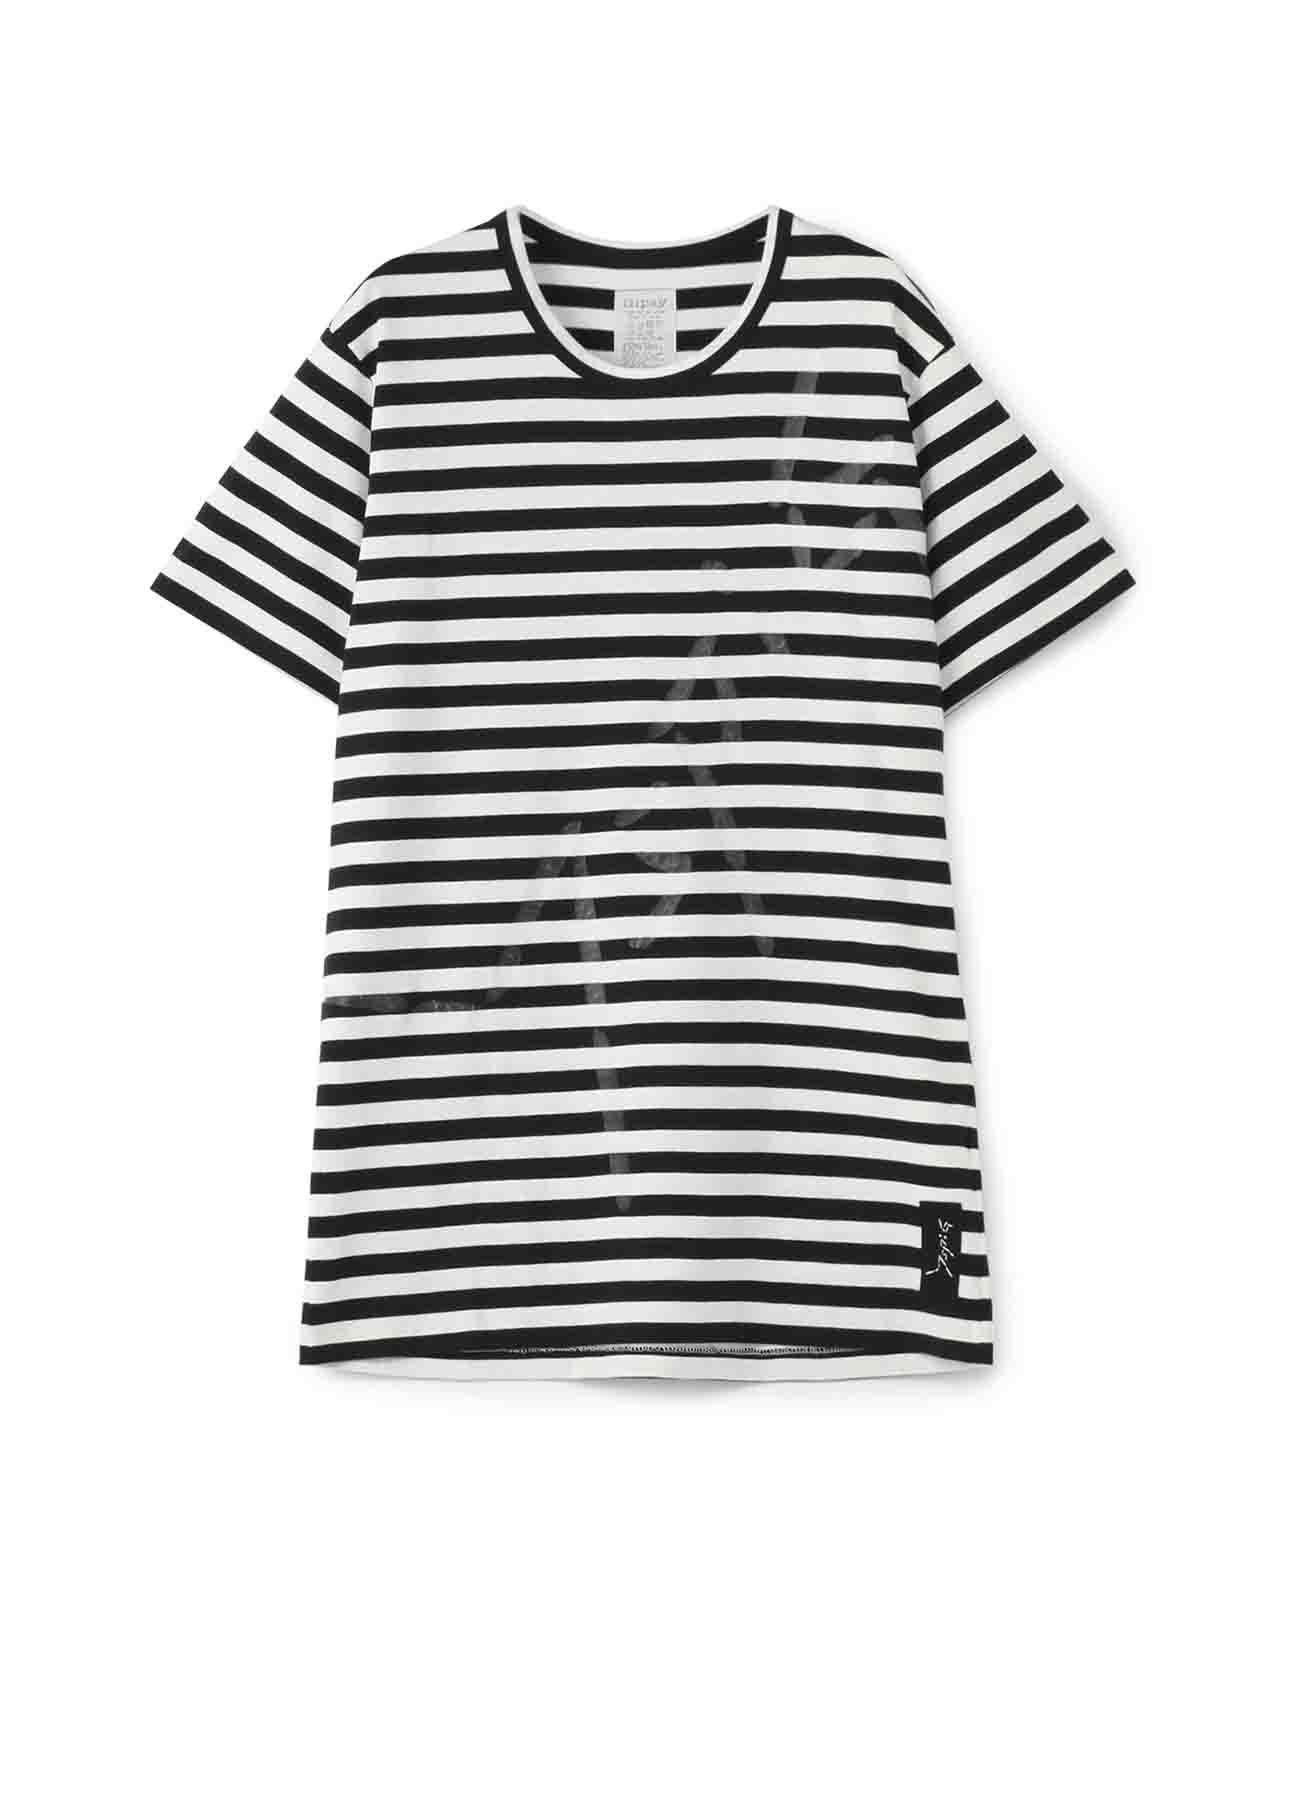 Gipsy WAX印花半袖T恤-宽松版